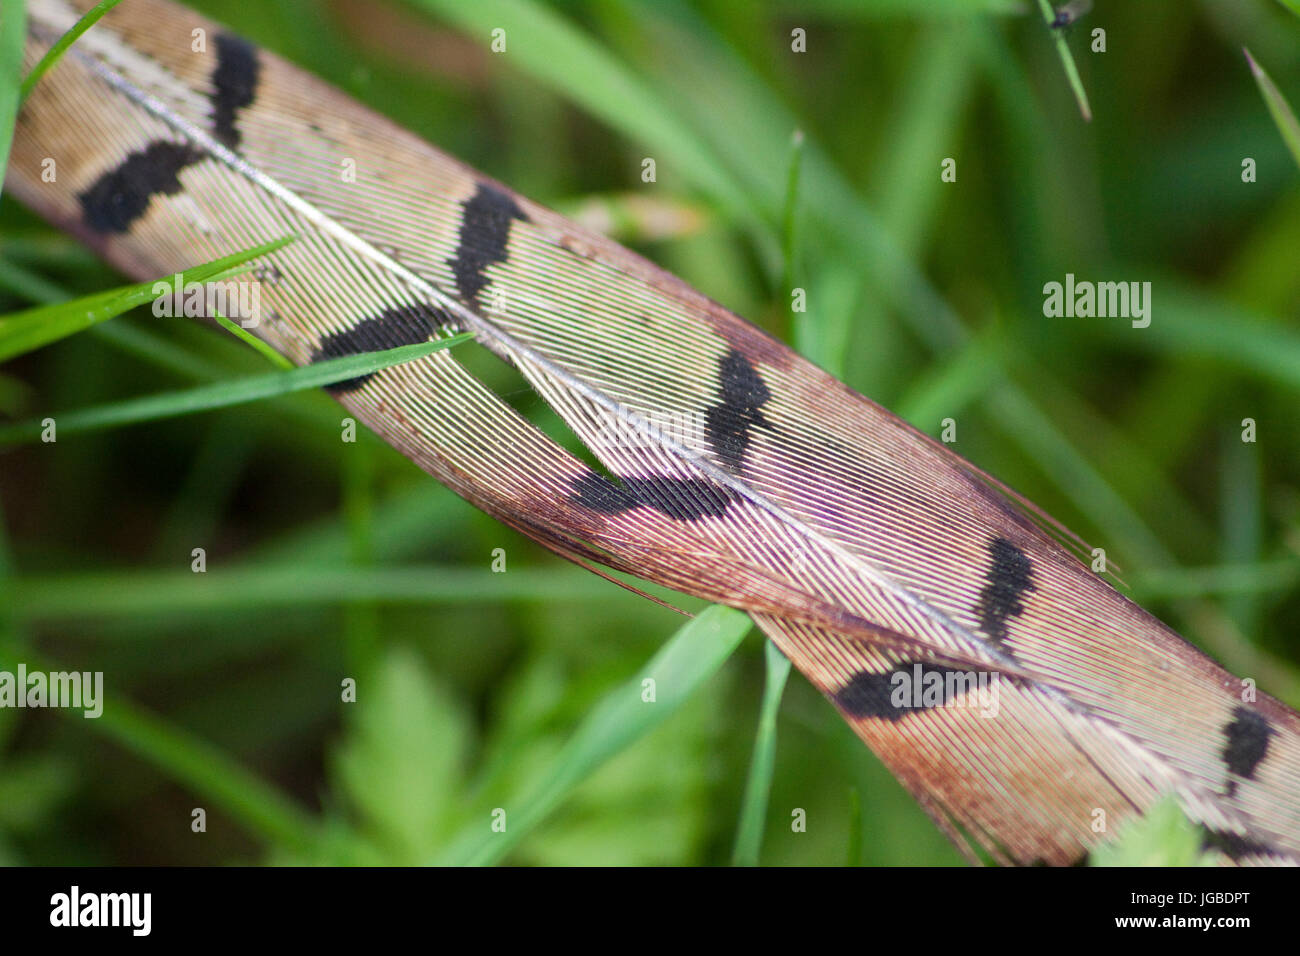 pheasant feather - Stock Image